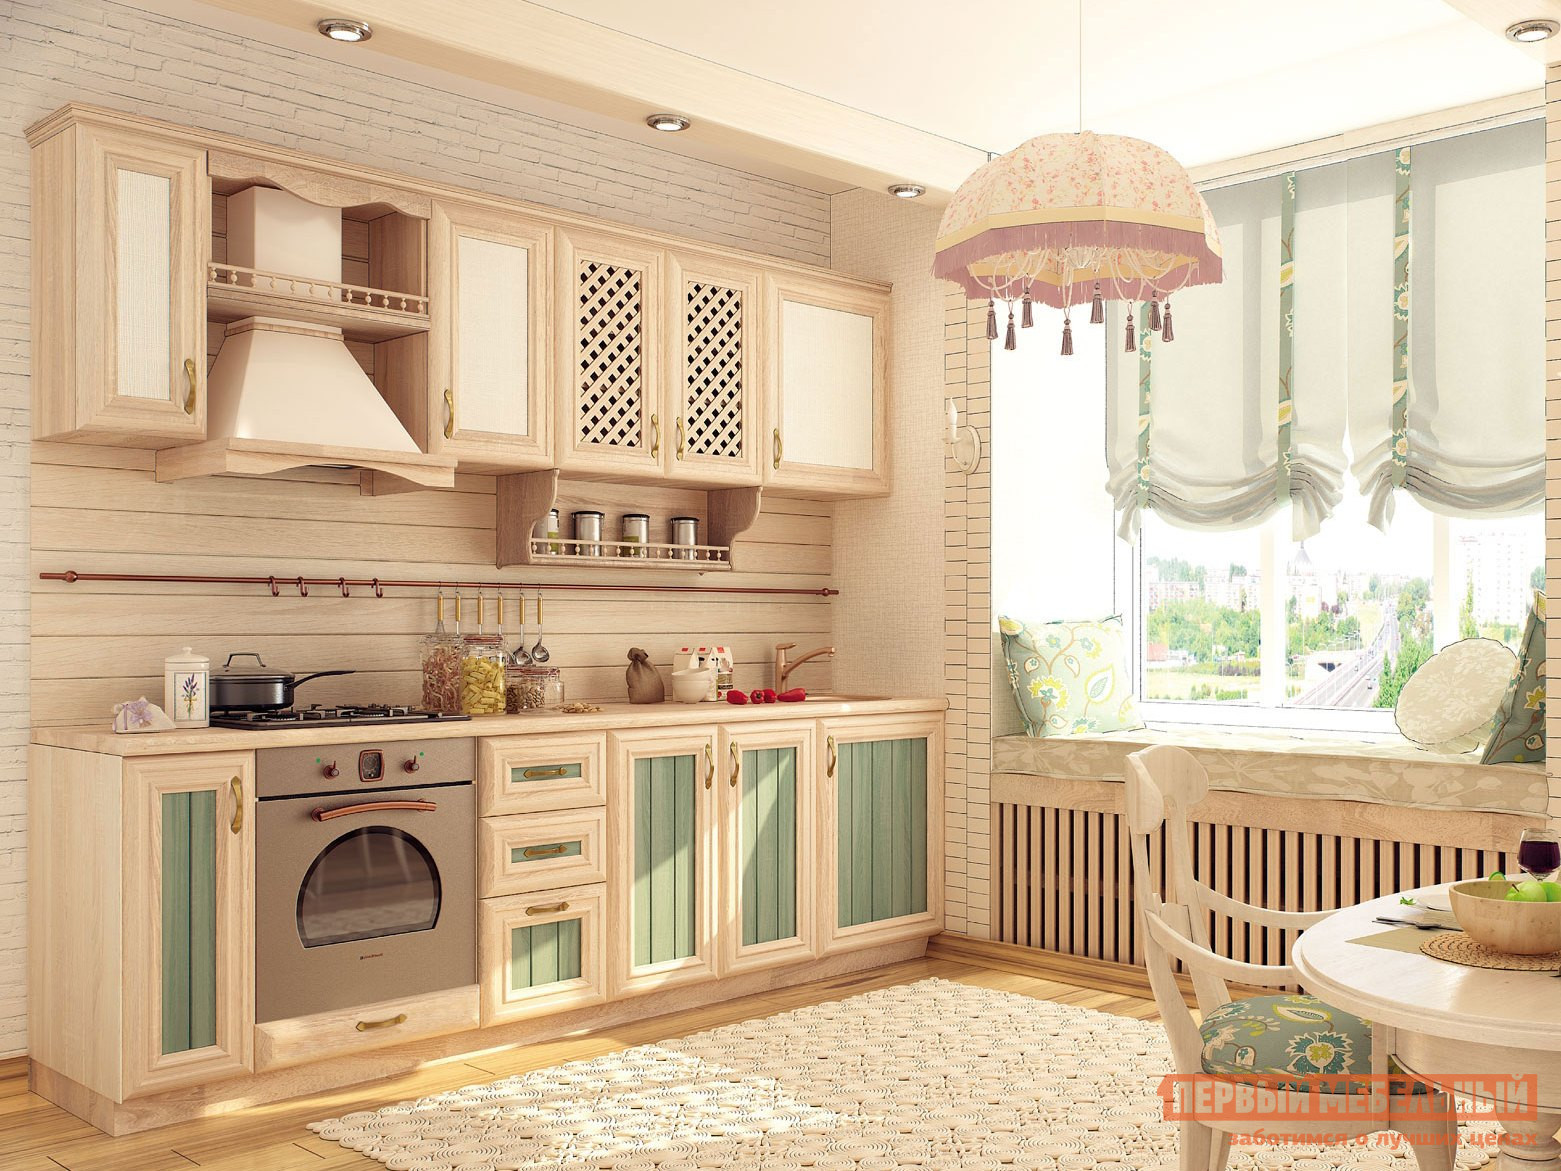 Кухонный гарнитур Любимый дом Кантри 260 см Сонома любимый дом кухонный гарнитур анастасия